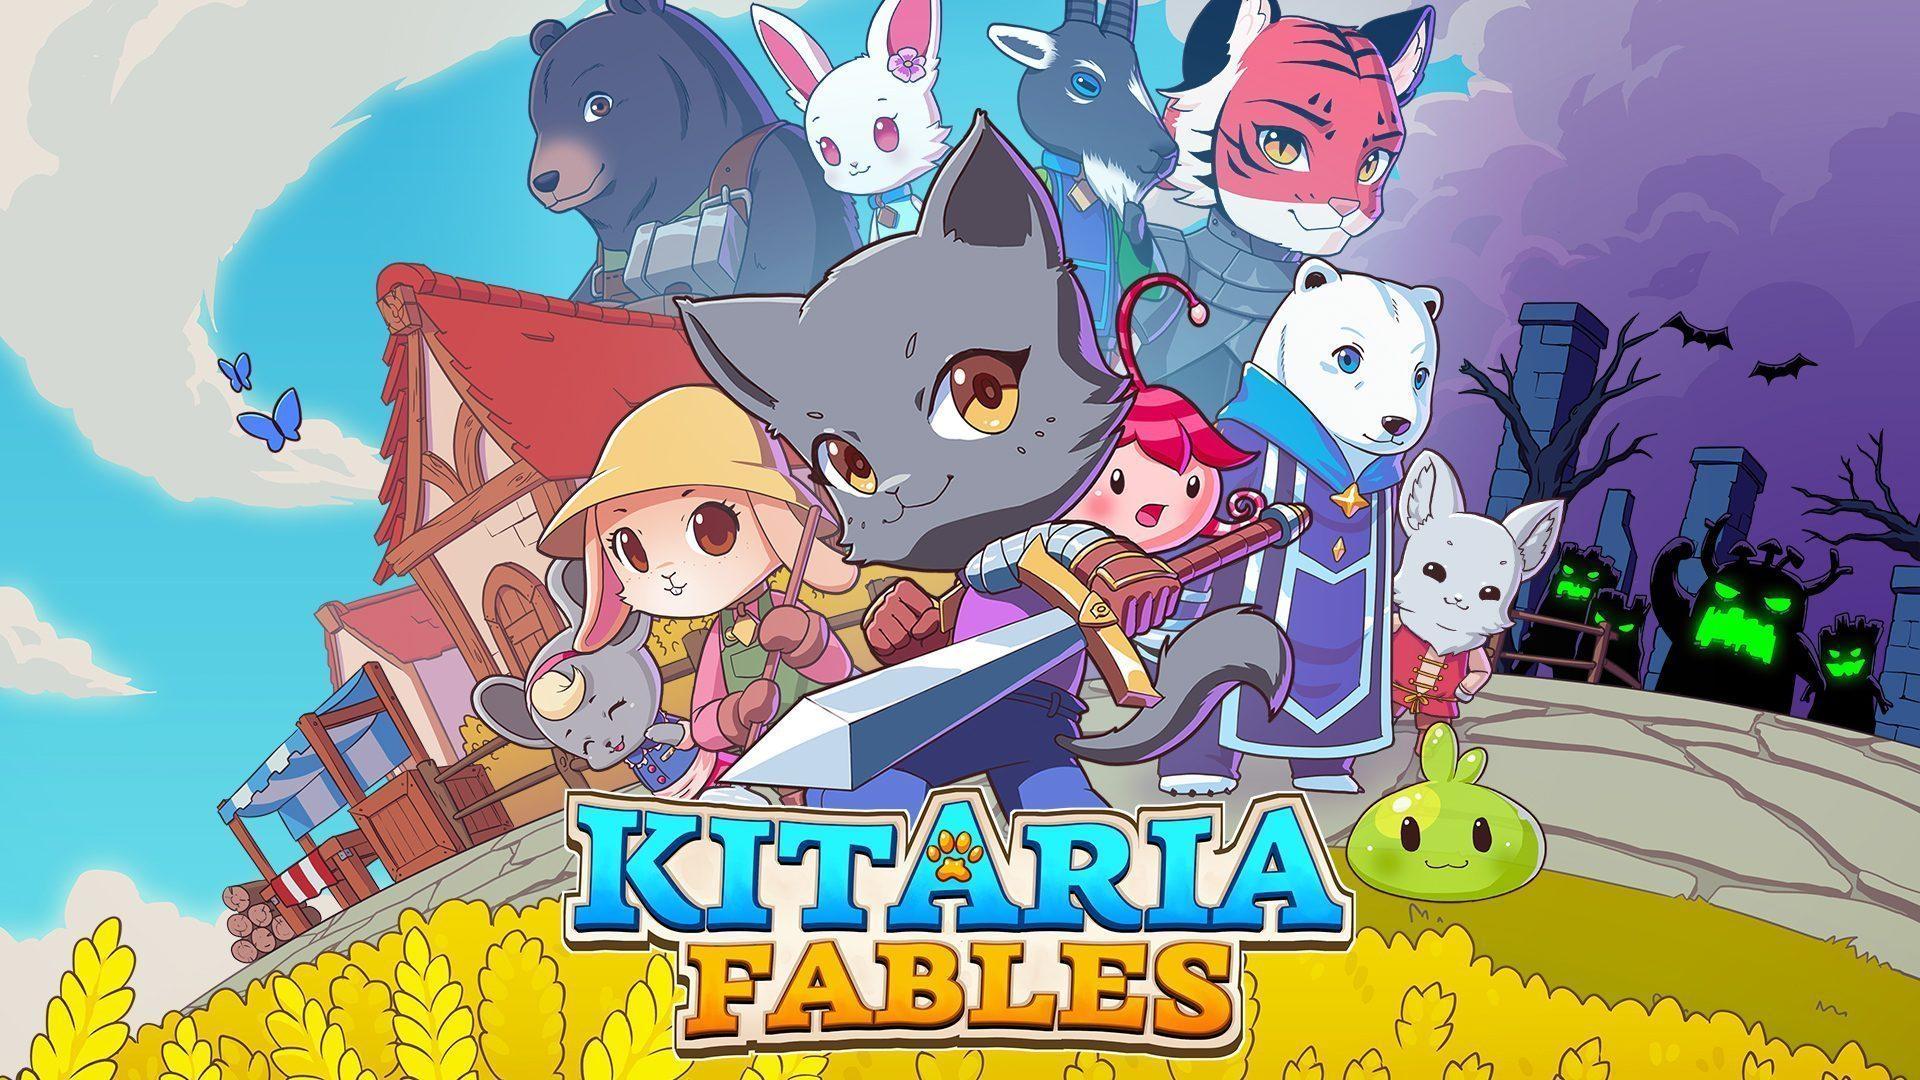 KITA_keyart_1920x1080_logo